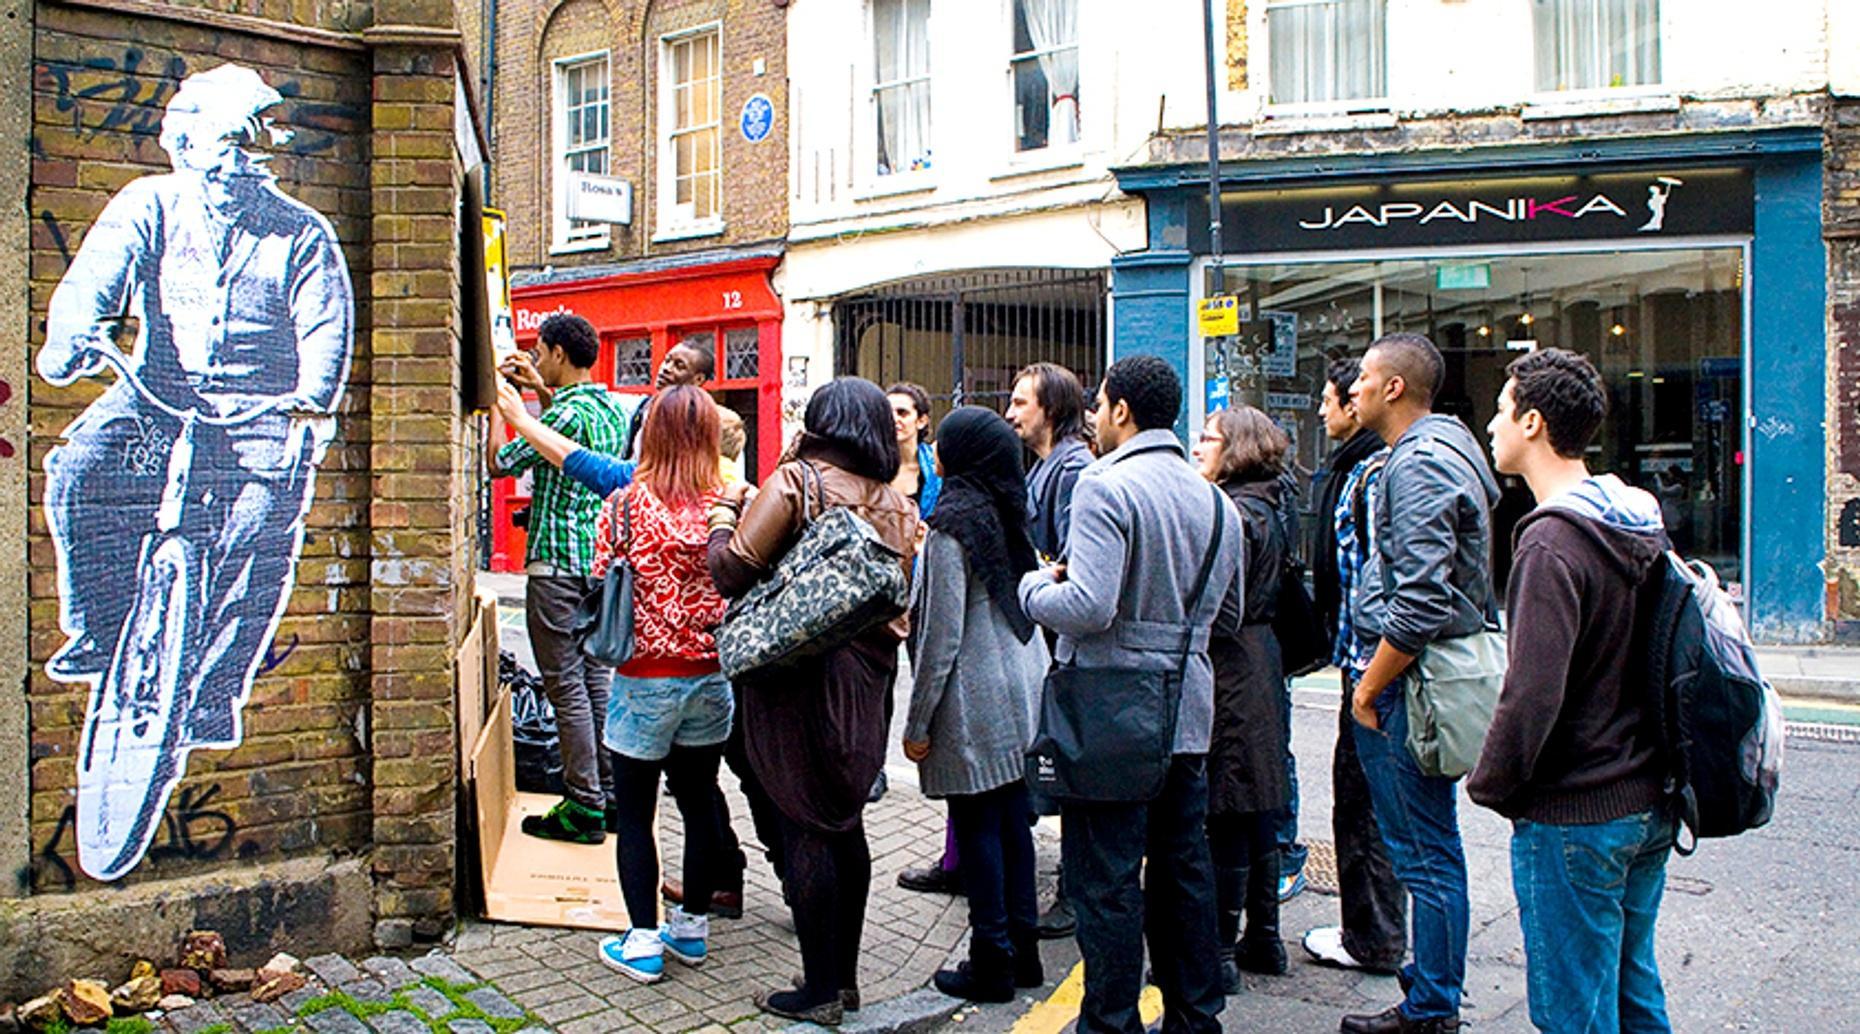 Guided Tour of London Street Art and Graffiti